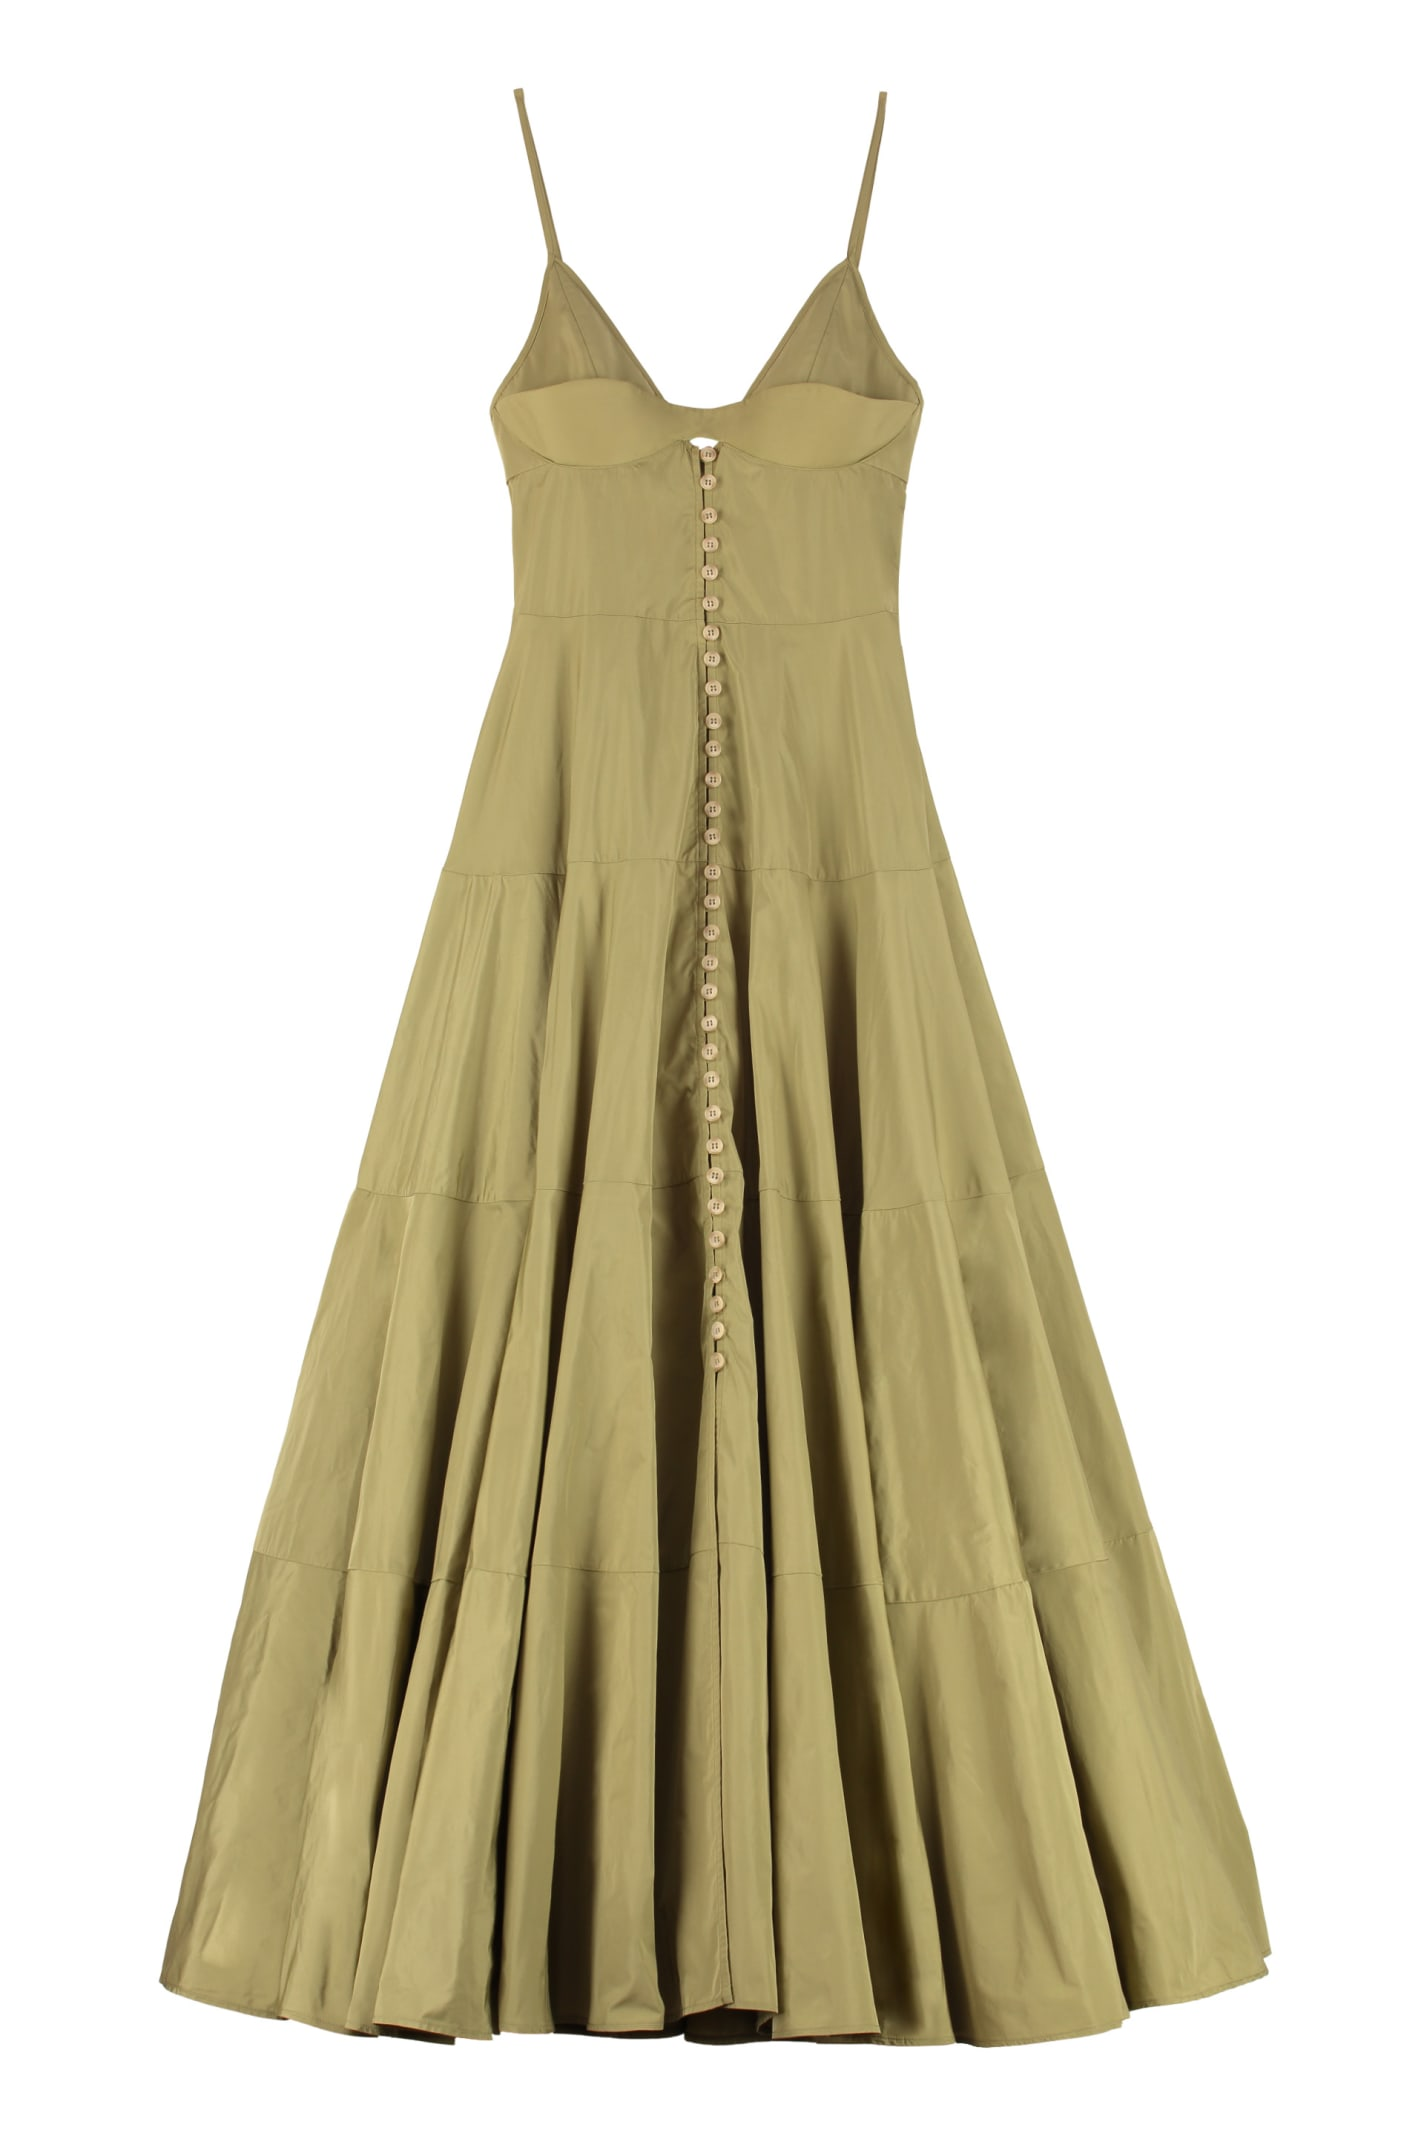 Buy Jacquemus Manosque Techno Taffetà Maxi Dress online, shop Jacquemus with free shipping